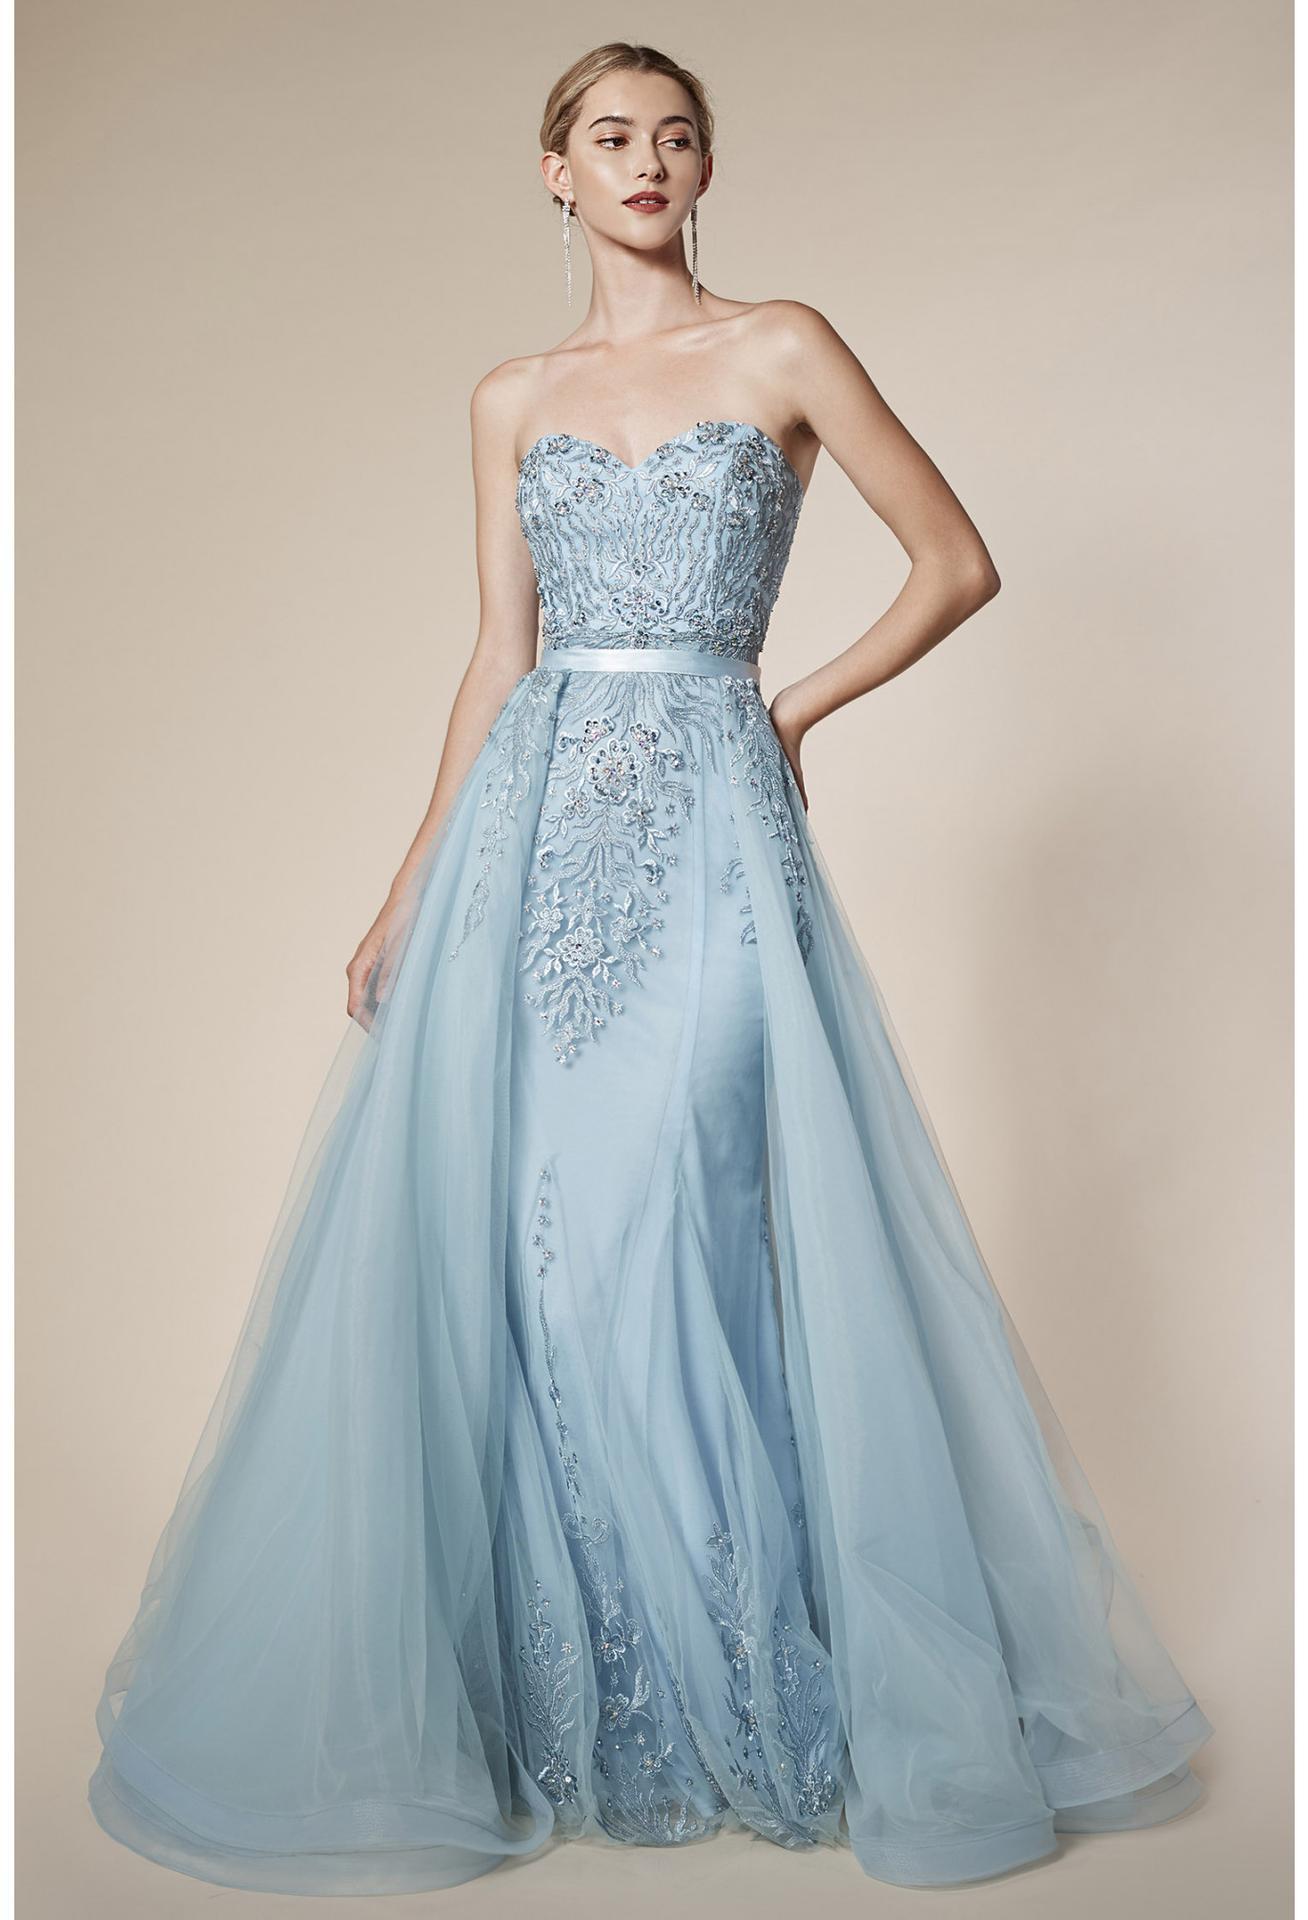 Nové spoločenské šaty :) - Obrázok č. 66